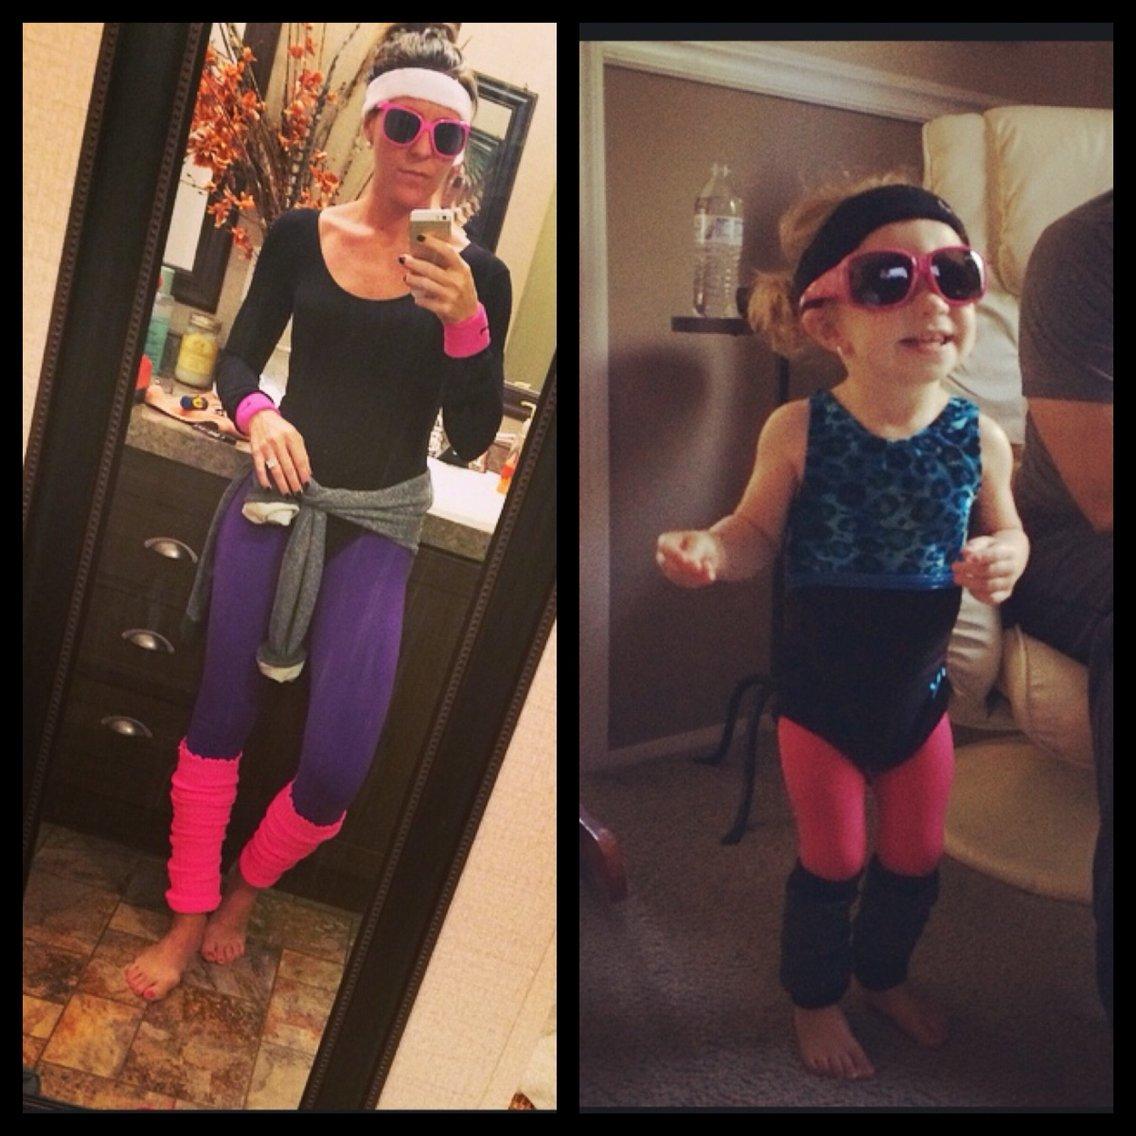 10 Most Popular Mommy Daughter Halloween Costume Ideas mother daughter matching halloween costumes halloween pinterest 2020